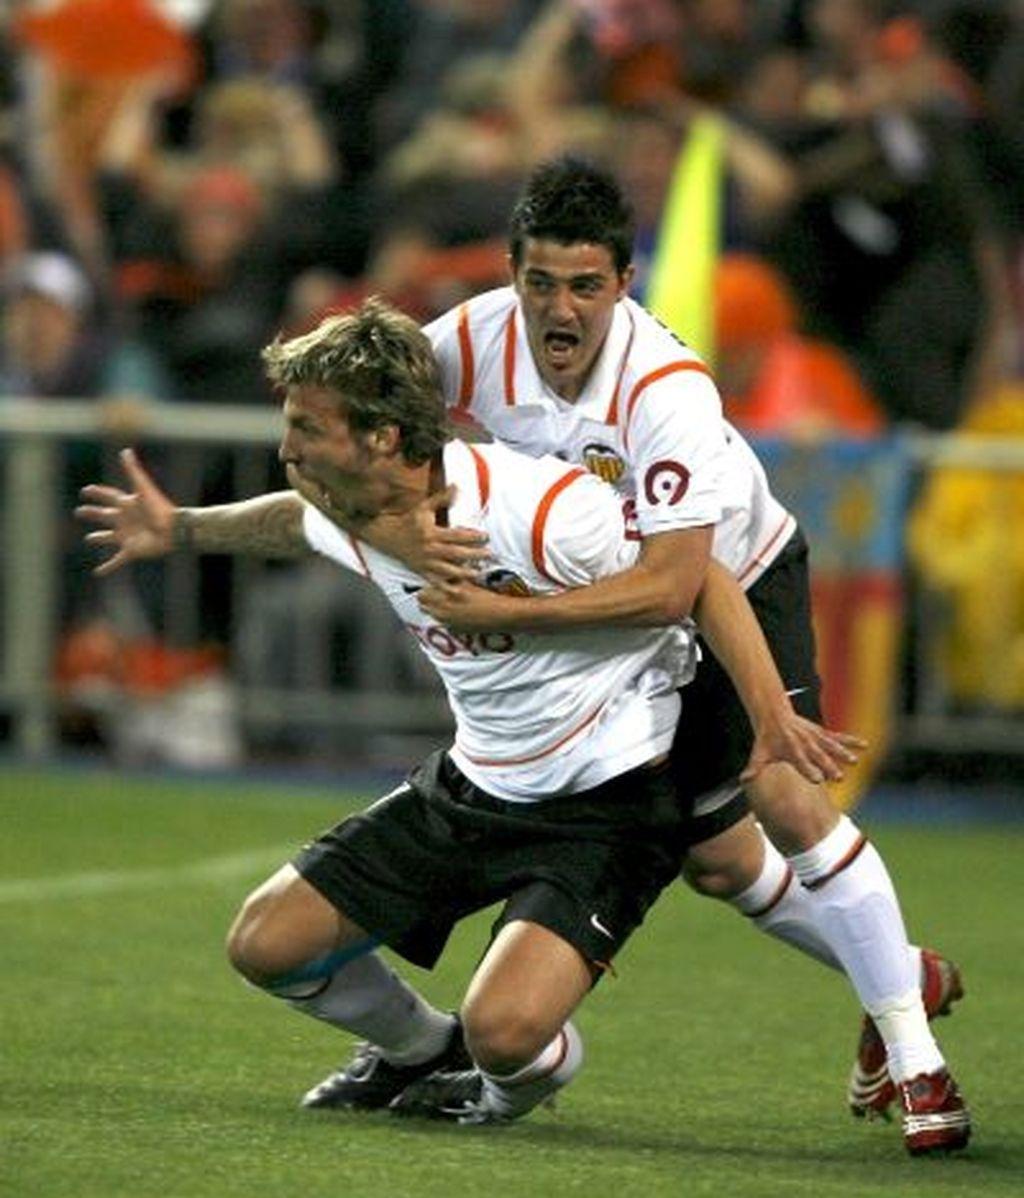 Valencia 2-0 Getafe